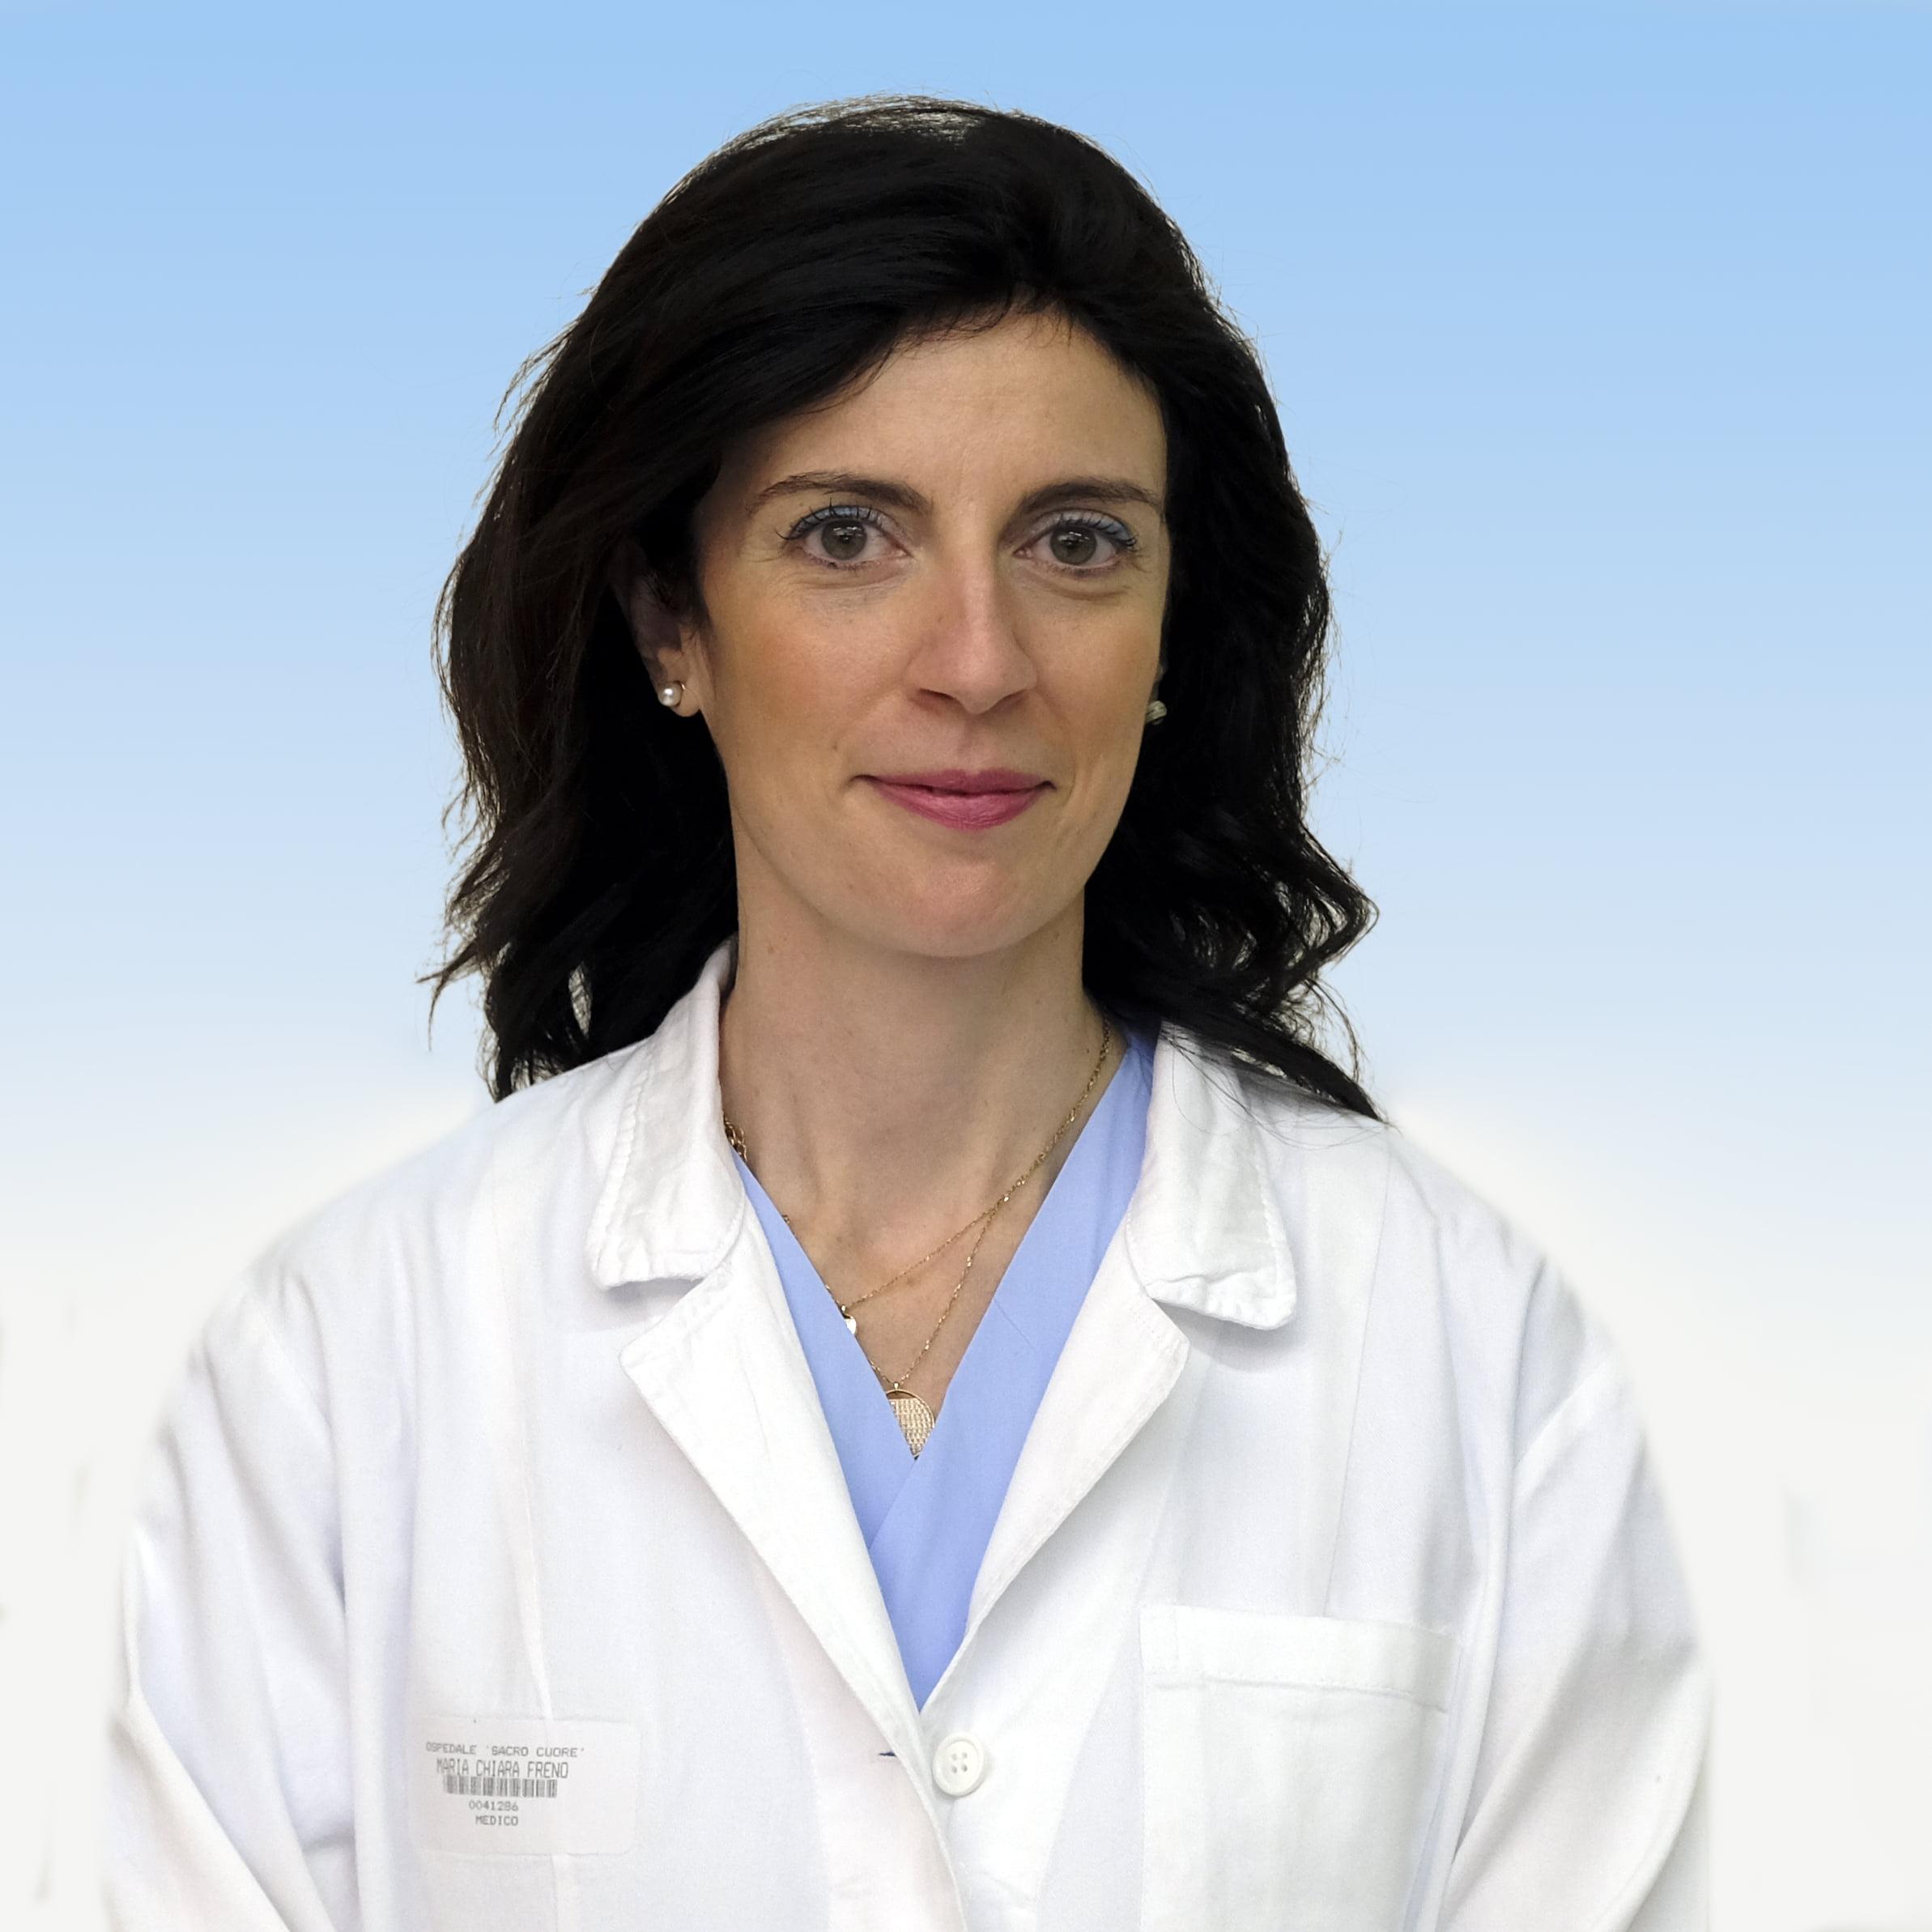 Chiara Freno, oculista IRCCS Ospedale Sacro Cuore Don Calabria di Negrar